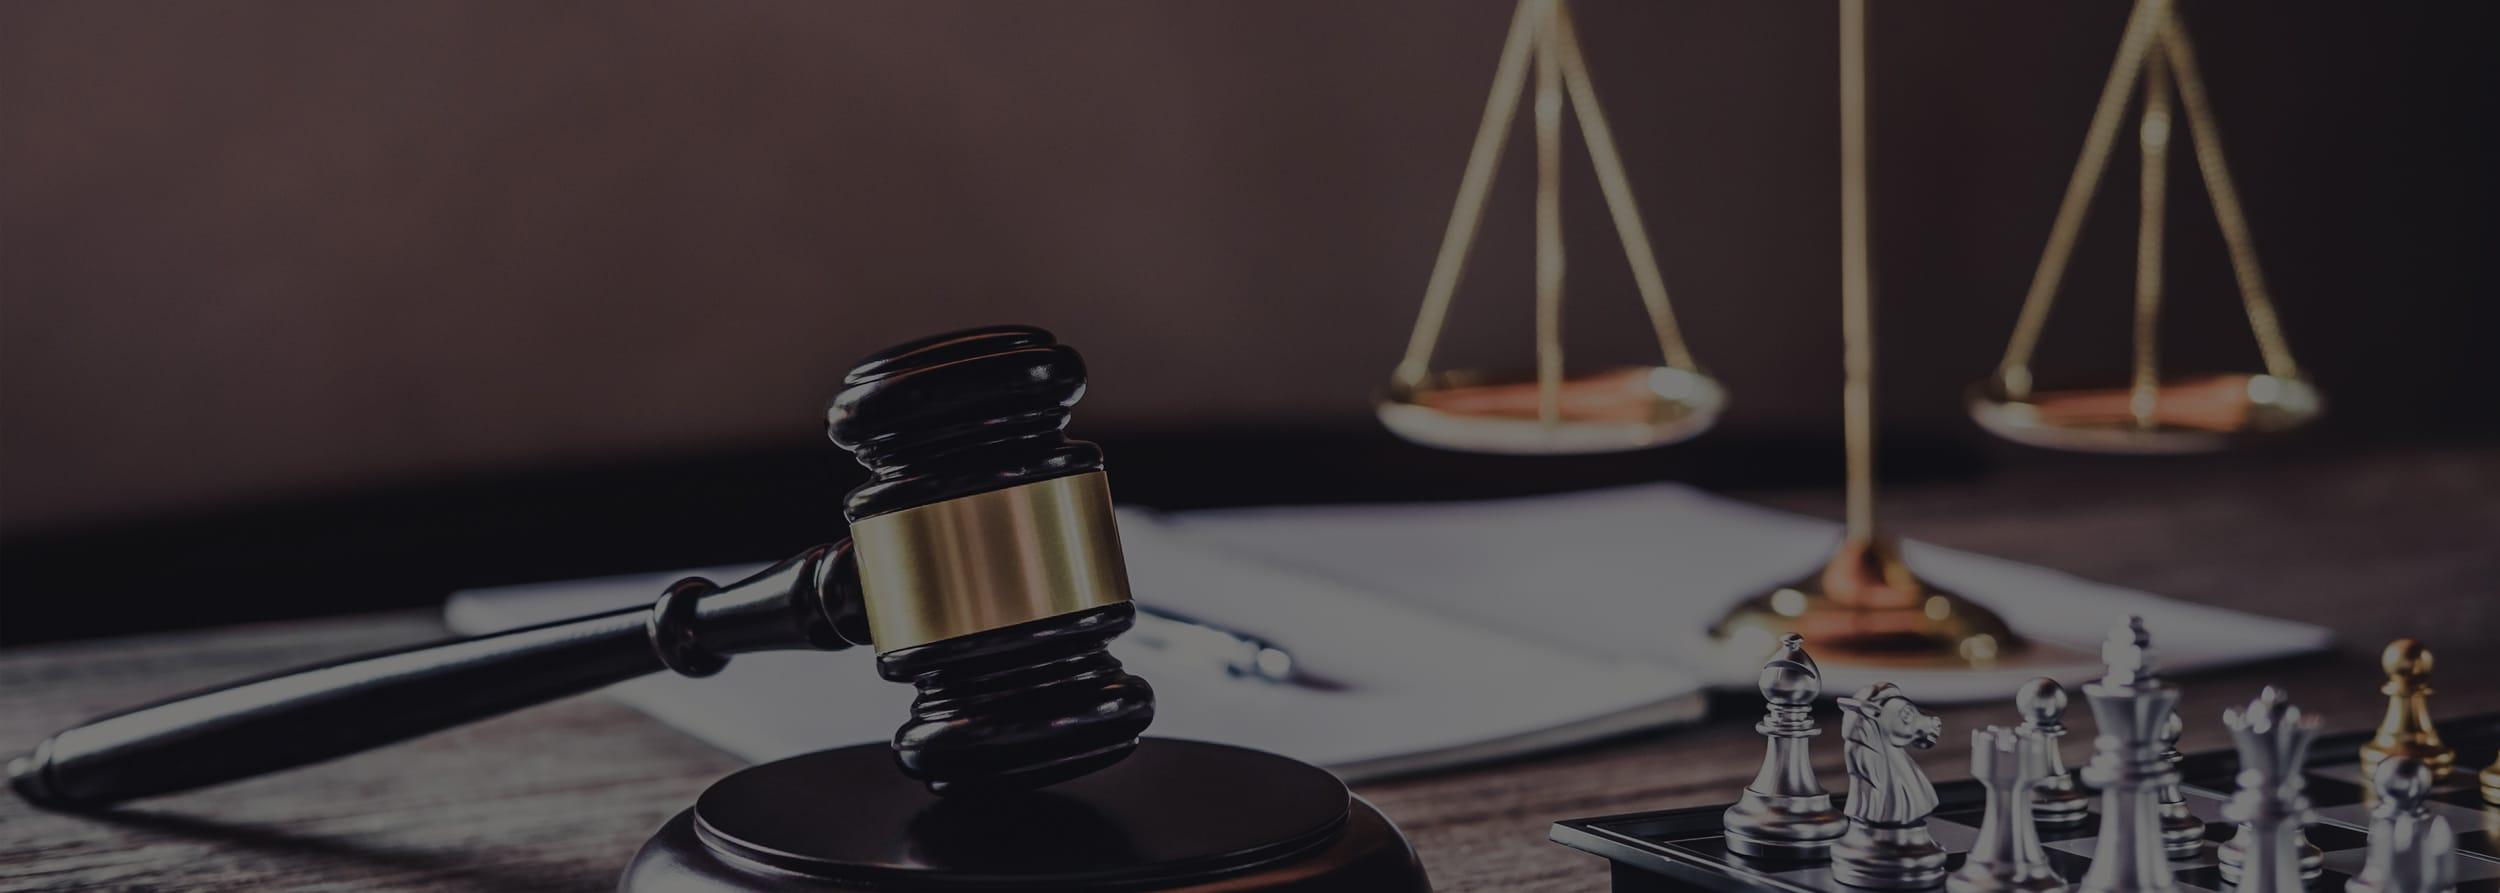 Divorce Attorney Leads header image